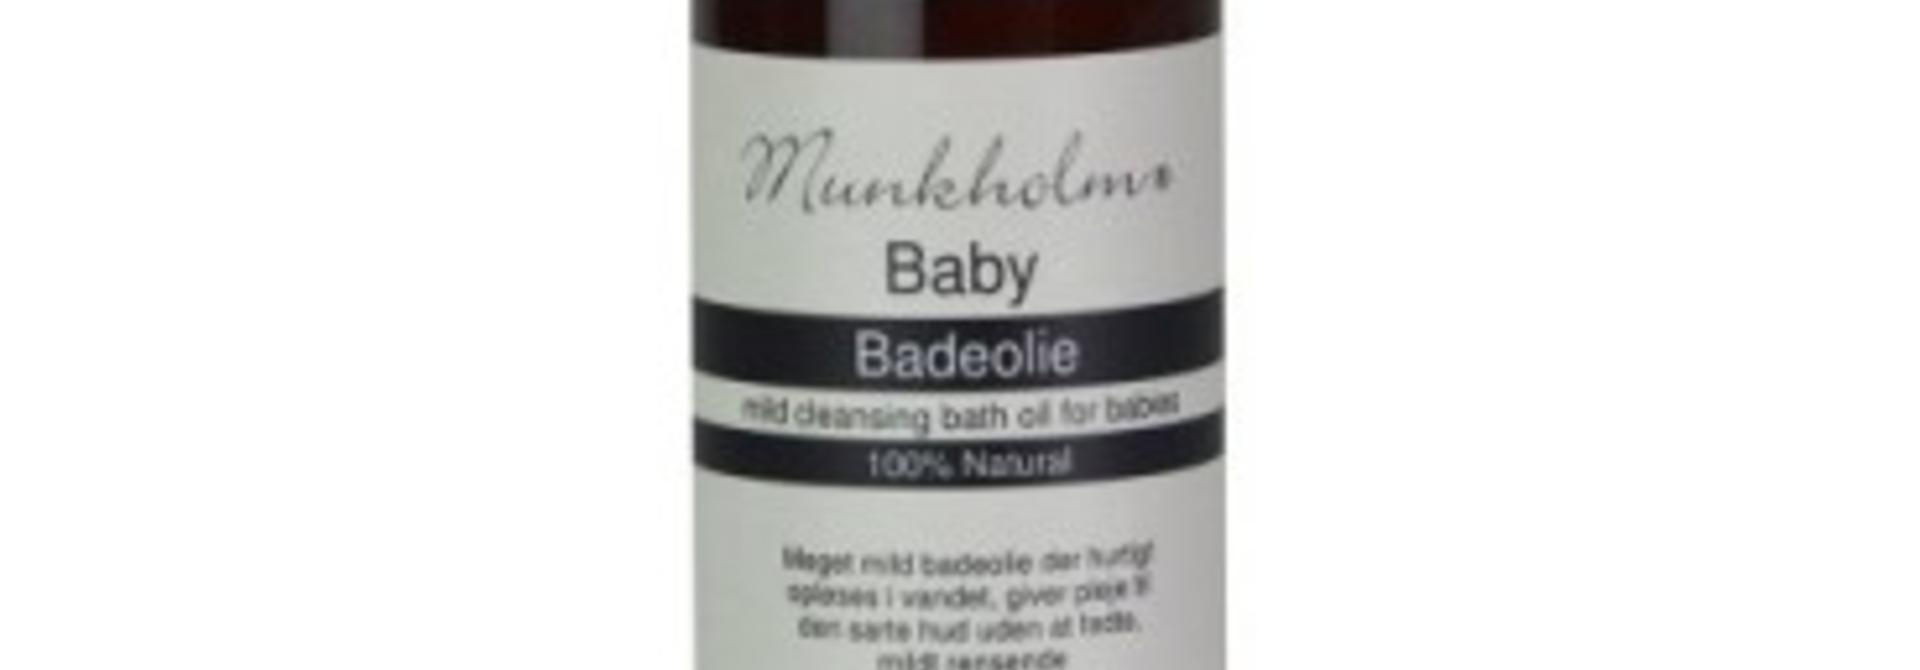 Baby badolie Munkholm